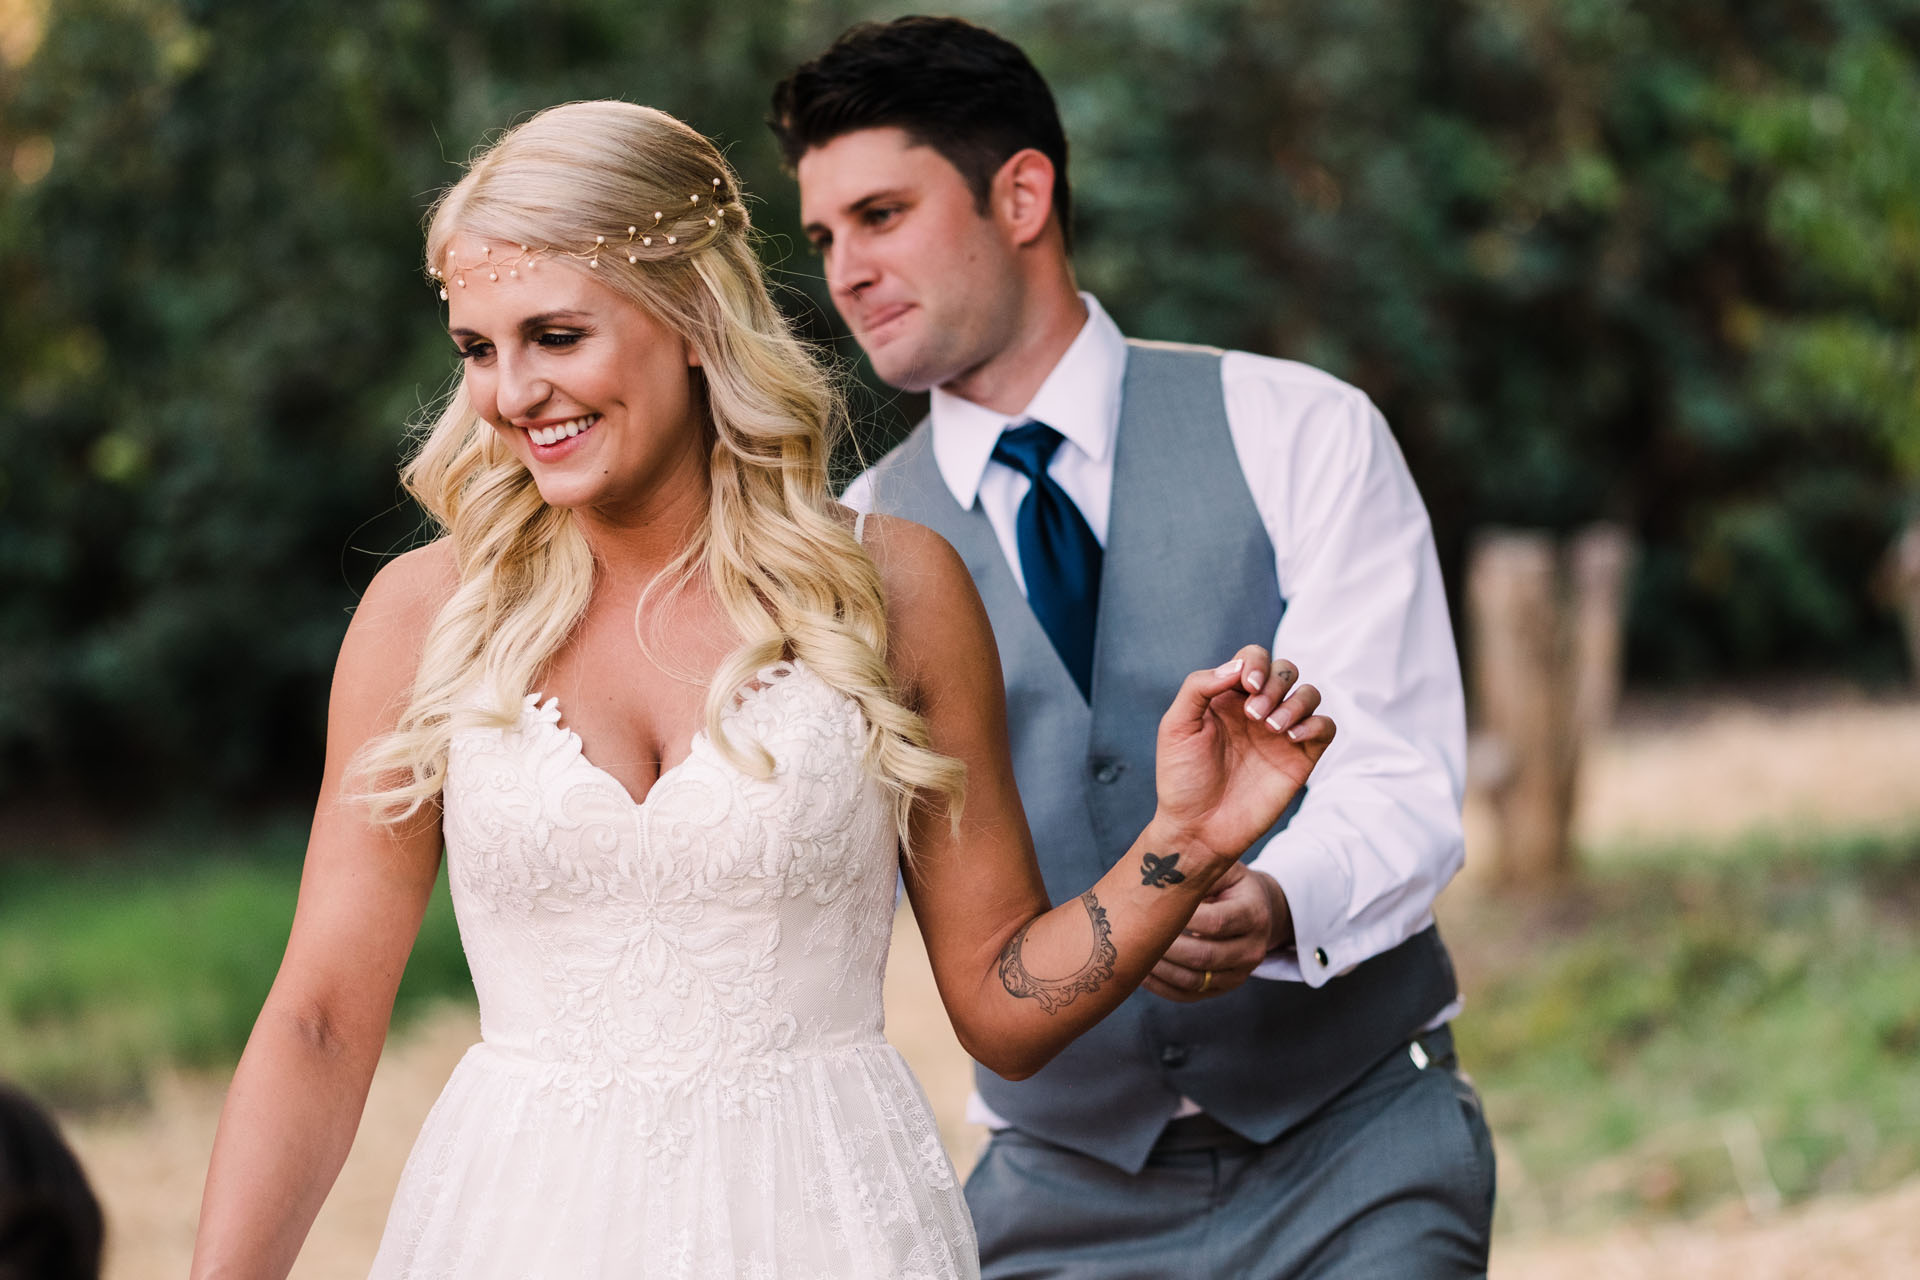 10-7-17 Devon and Jordan's Wedding-143.jpg